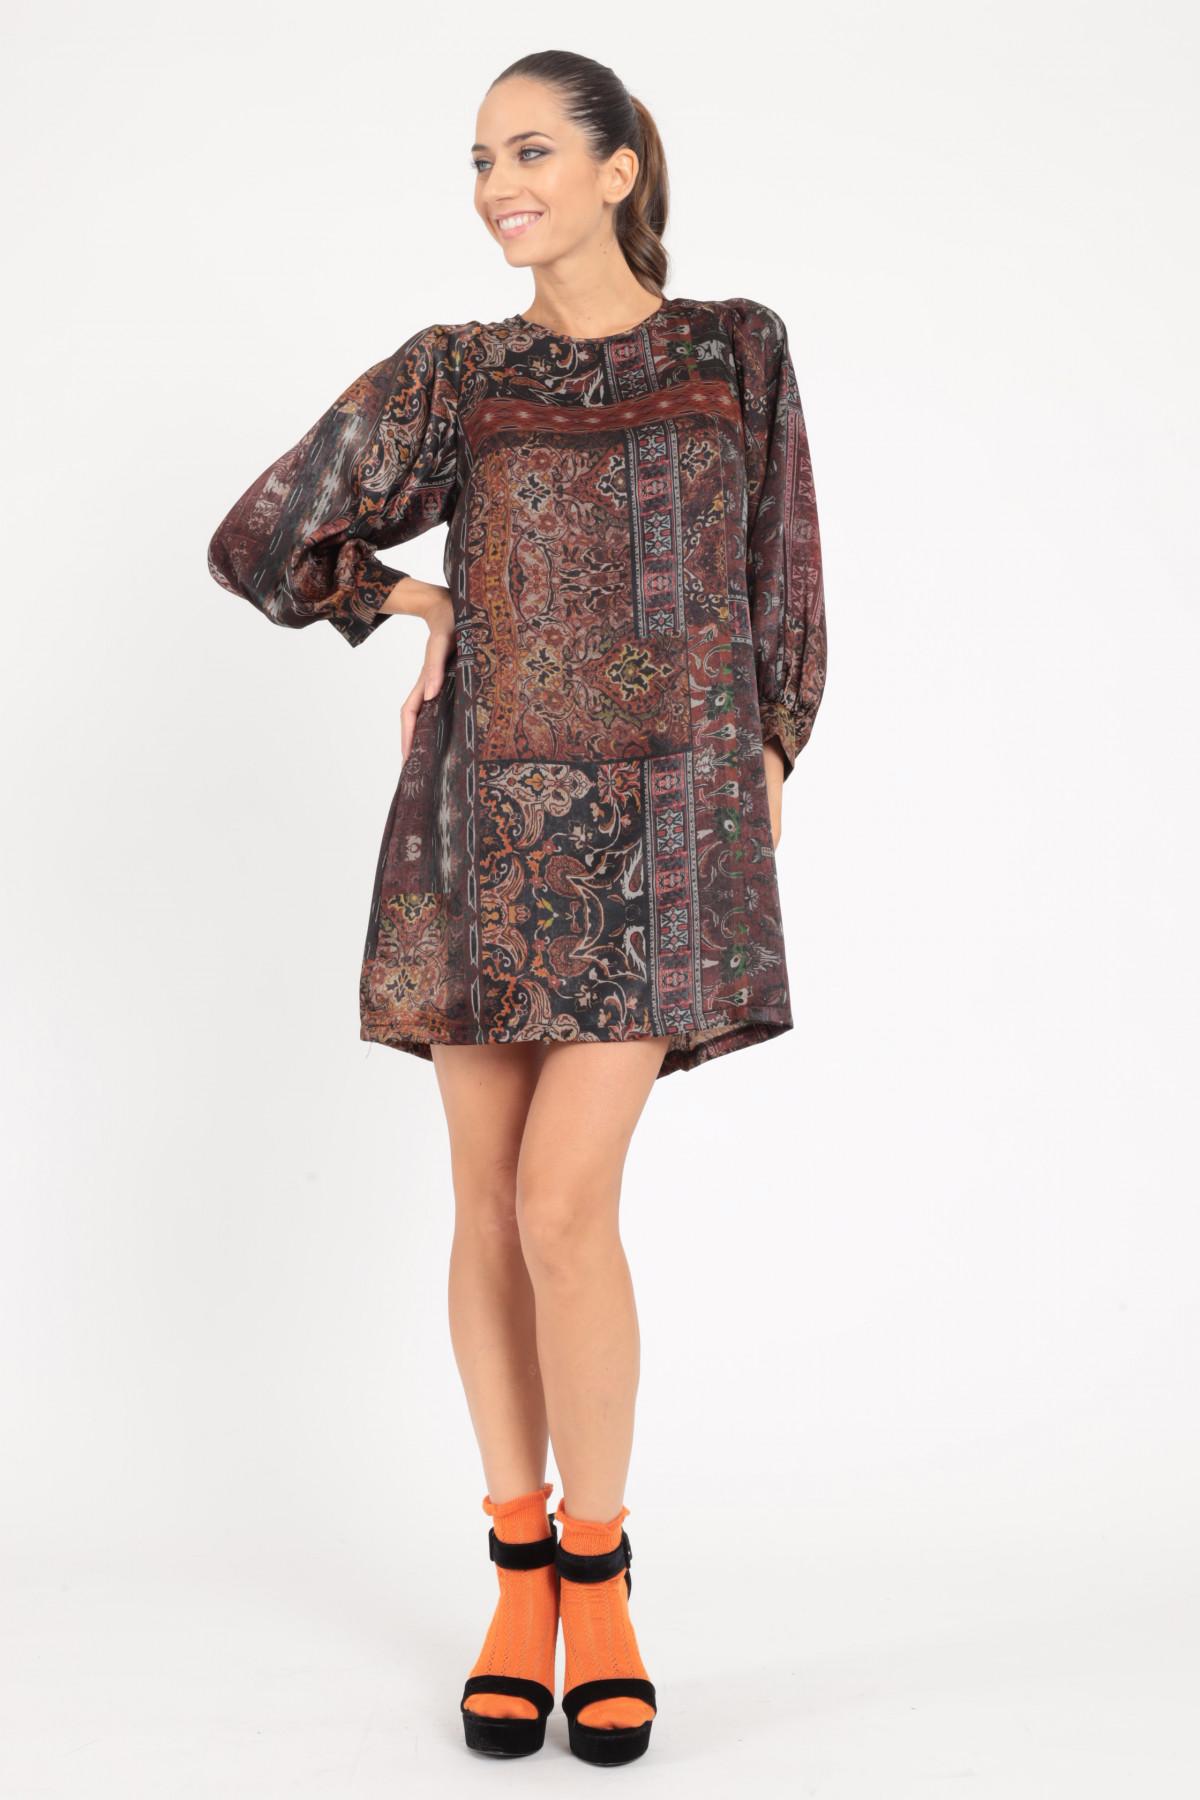 Long Sleeve Dress in Patchwork Pattern